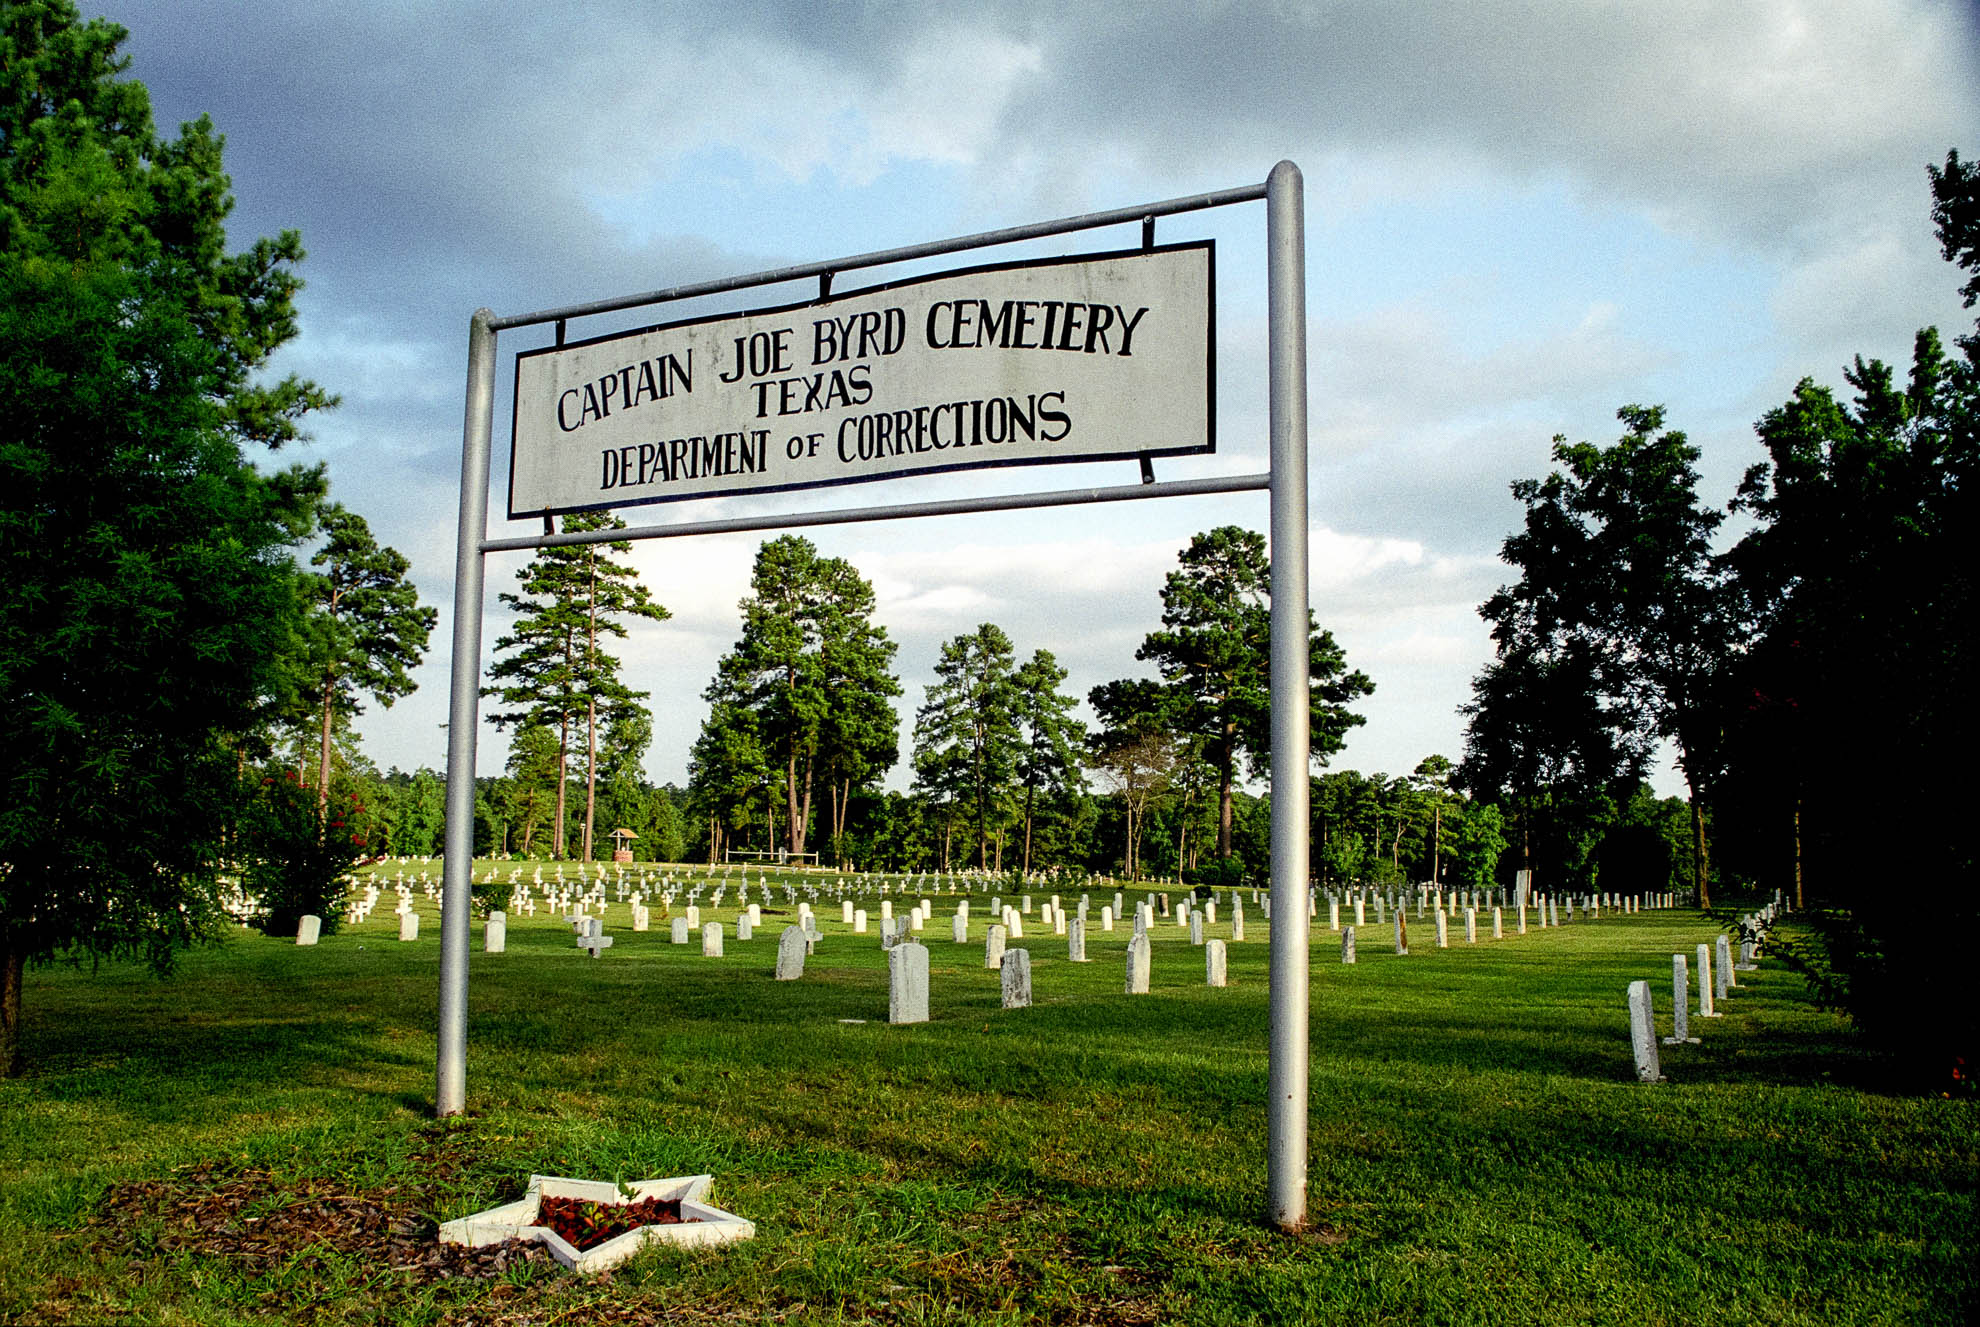 death penalty, photography, photos, execution, prison, documentary, huntsville, texas, cemetery, joe byrd, grave, gravesite